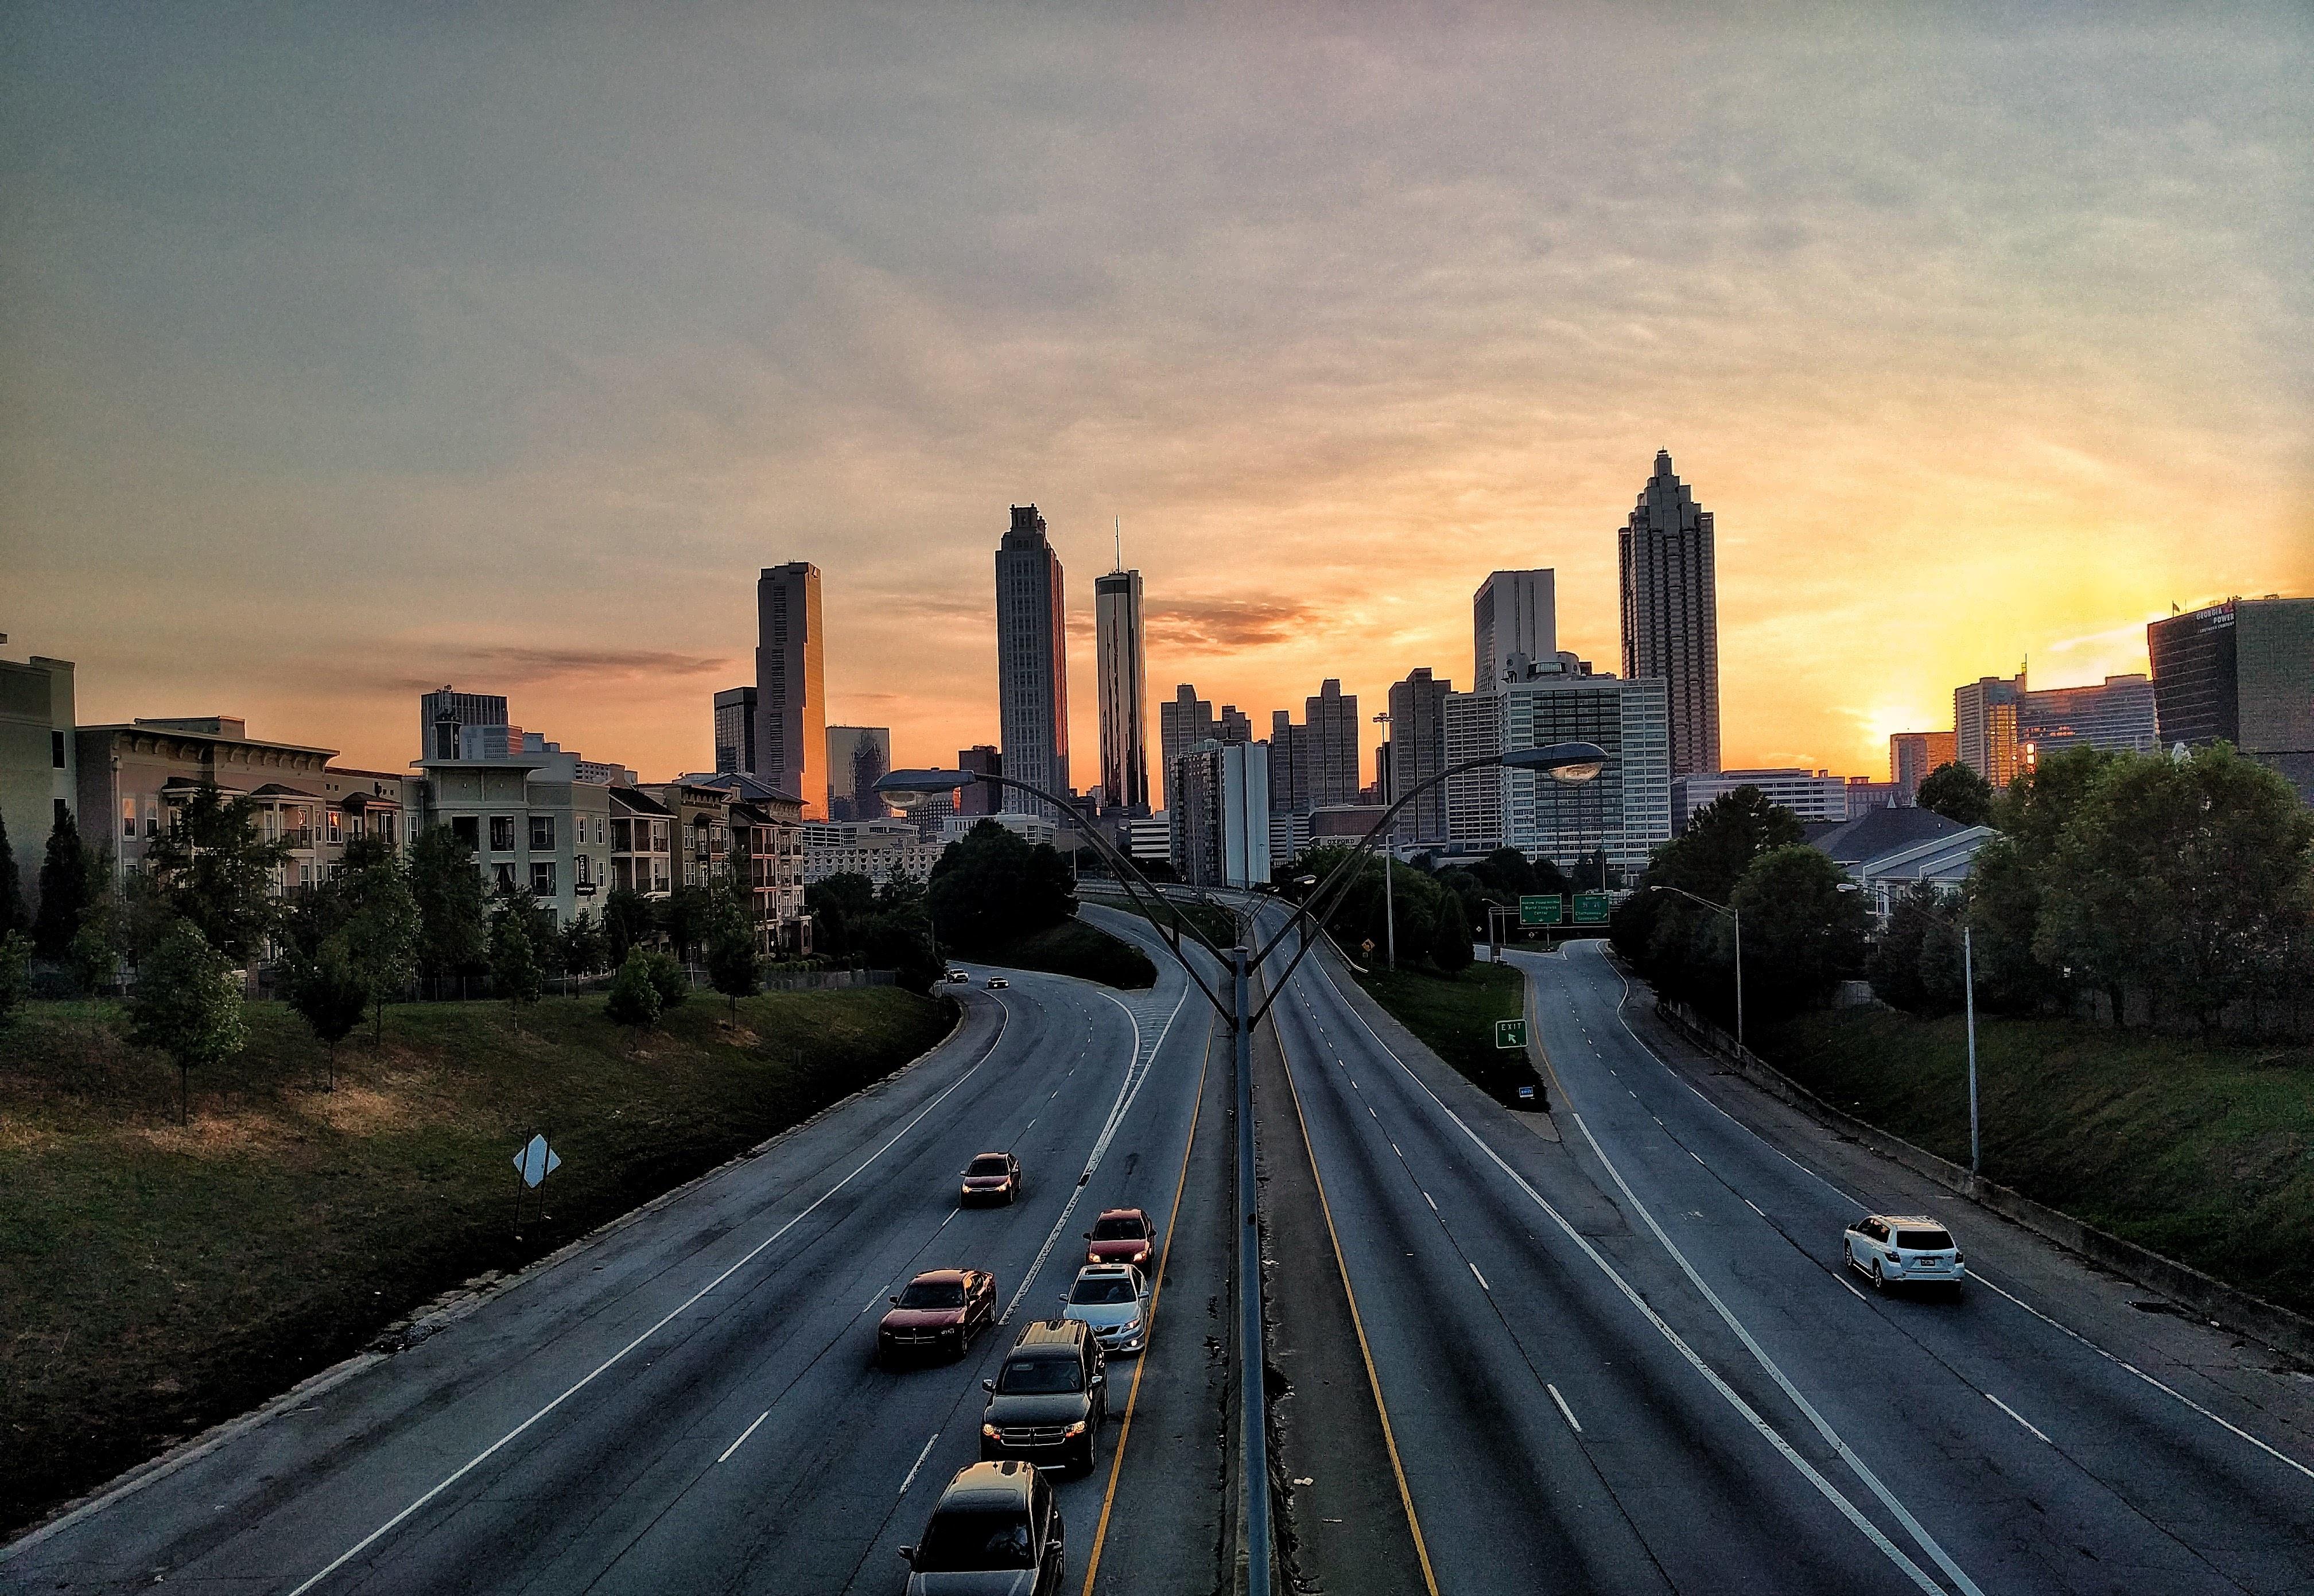 Картинка дорога с городами